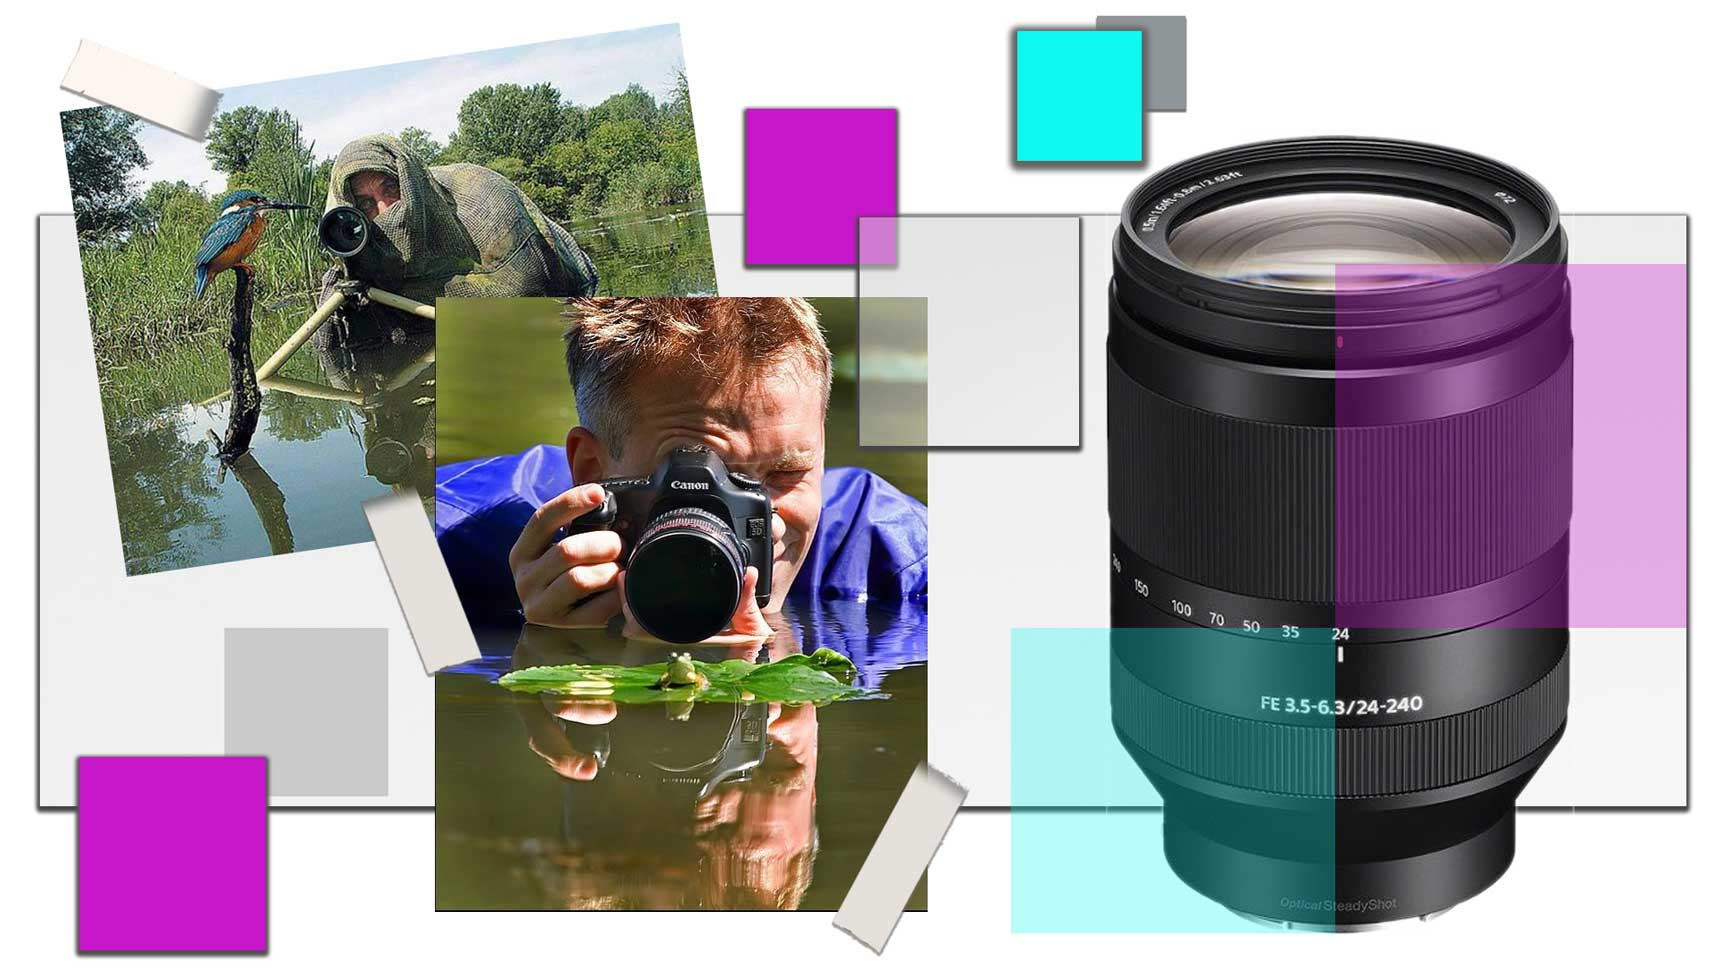 professiona1 photographe 7a - چگونه میتوان حرفه عکاسی را برای همیشه داشت ؟